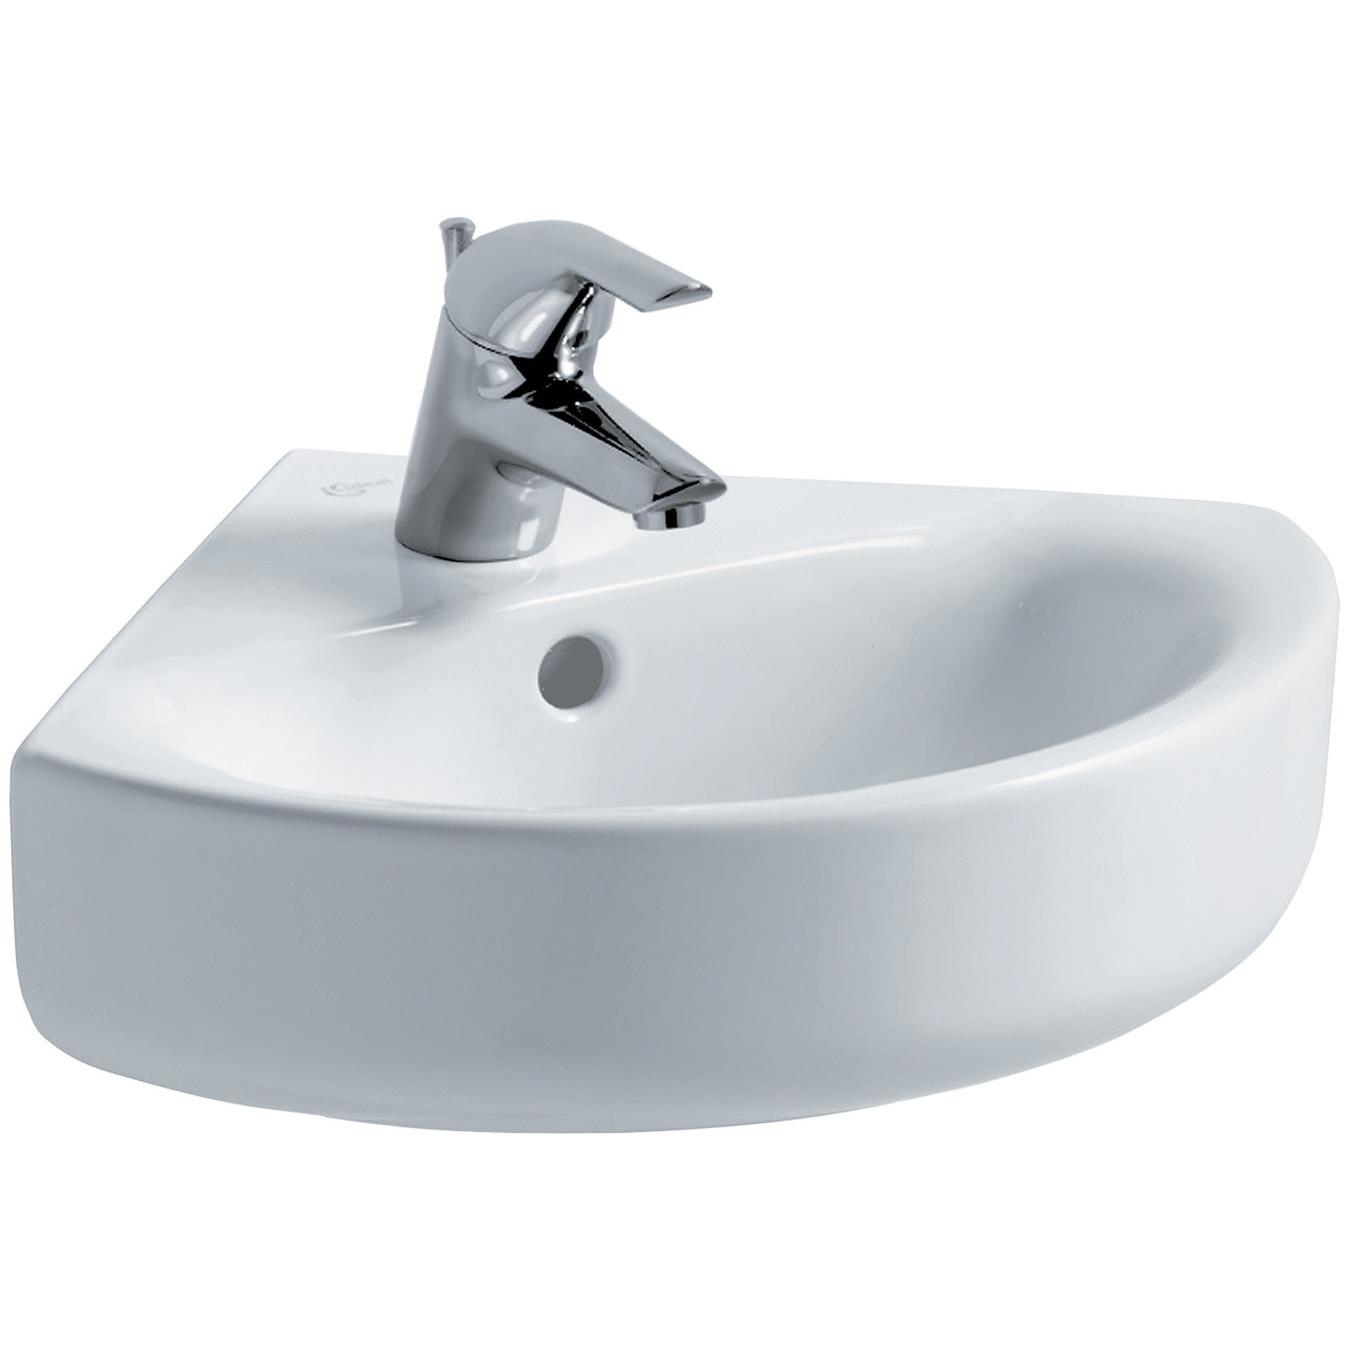 Ideal Standard Concept Arc 45cm Corner Handrinse Basin